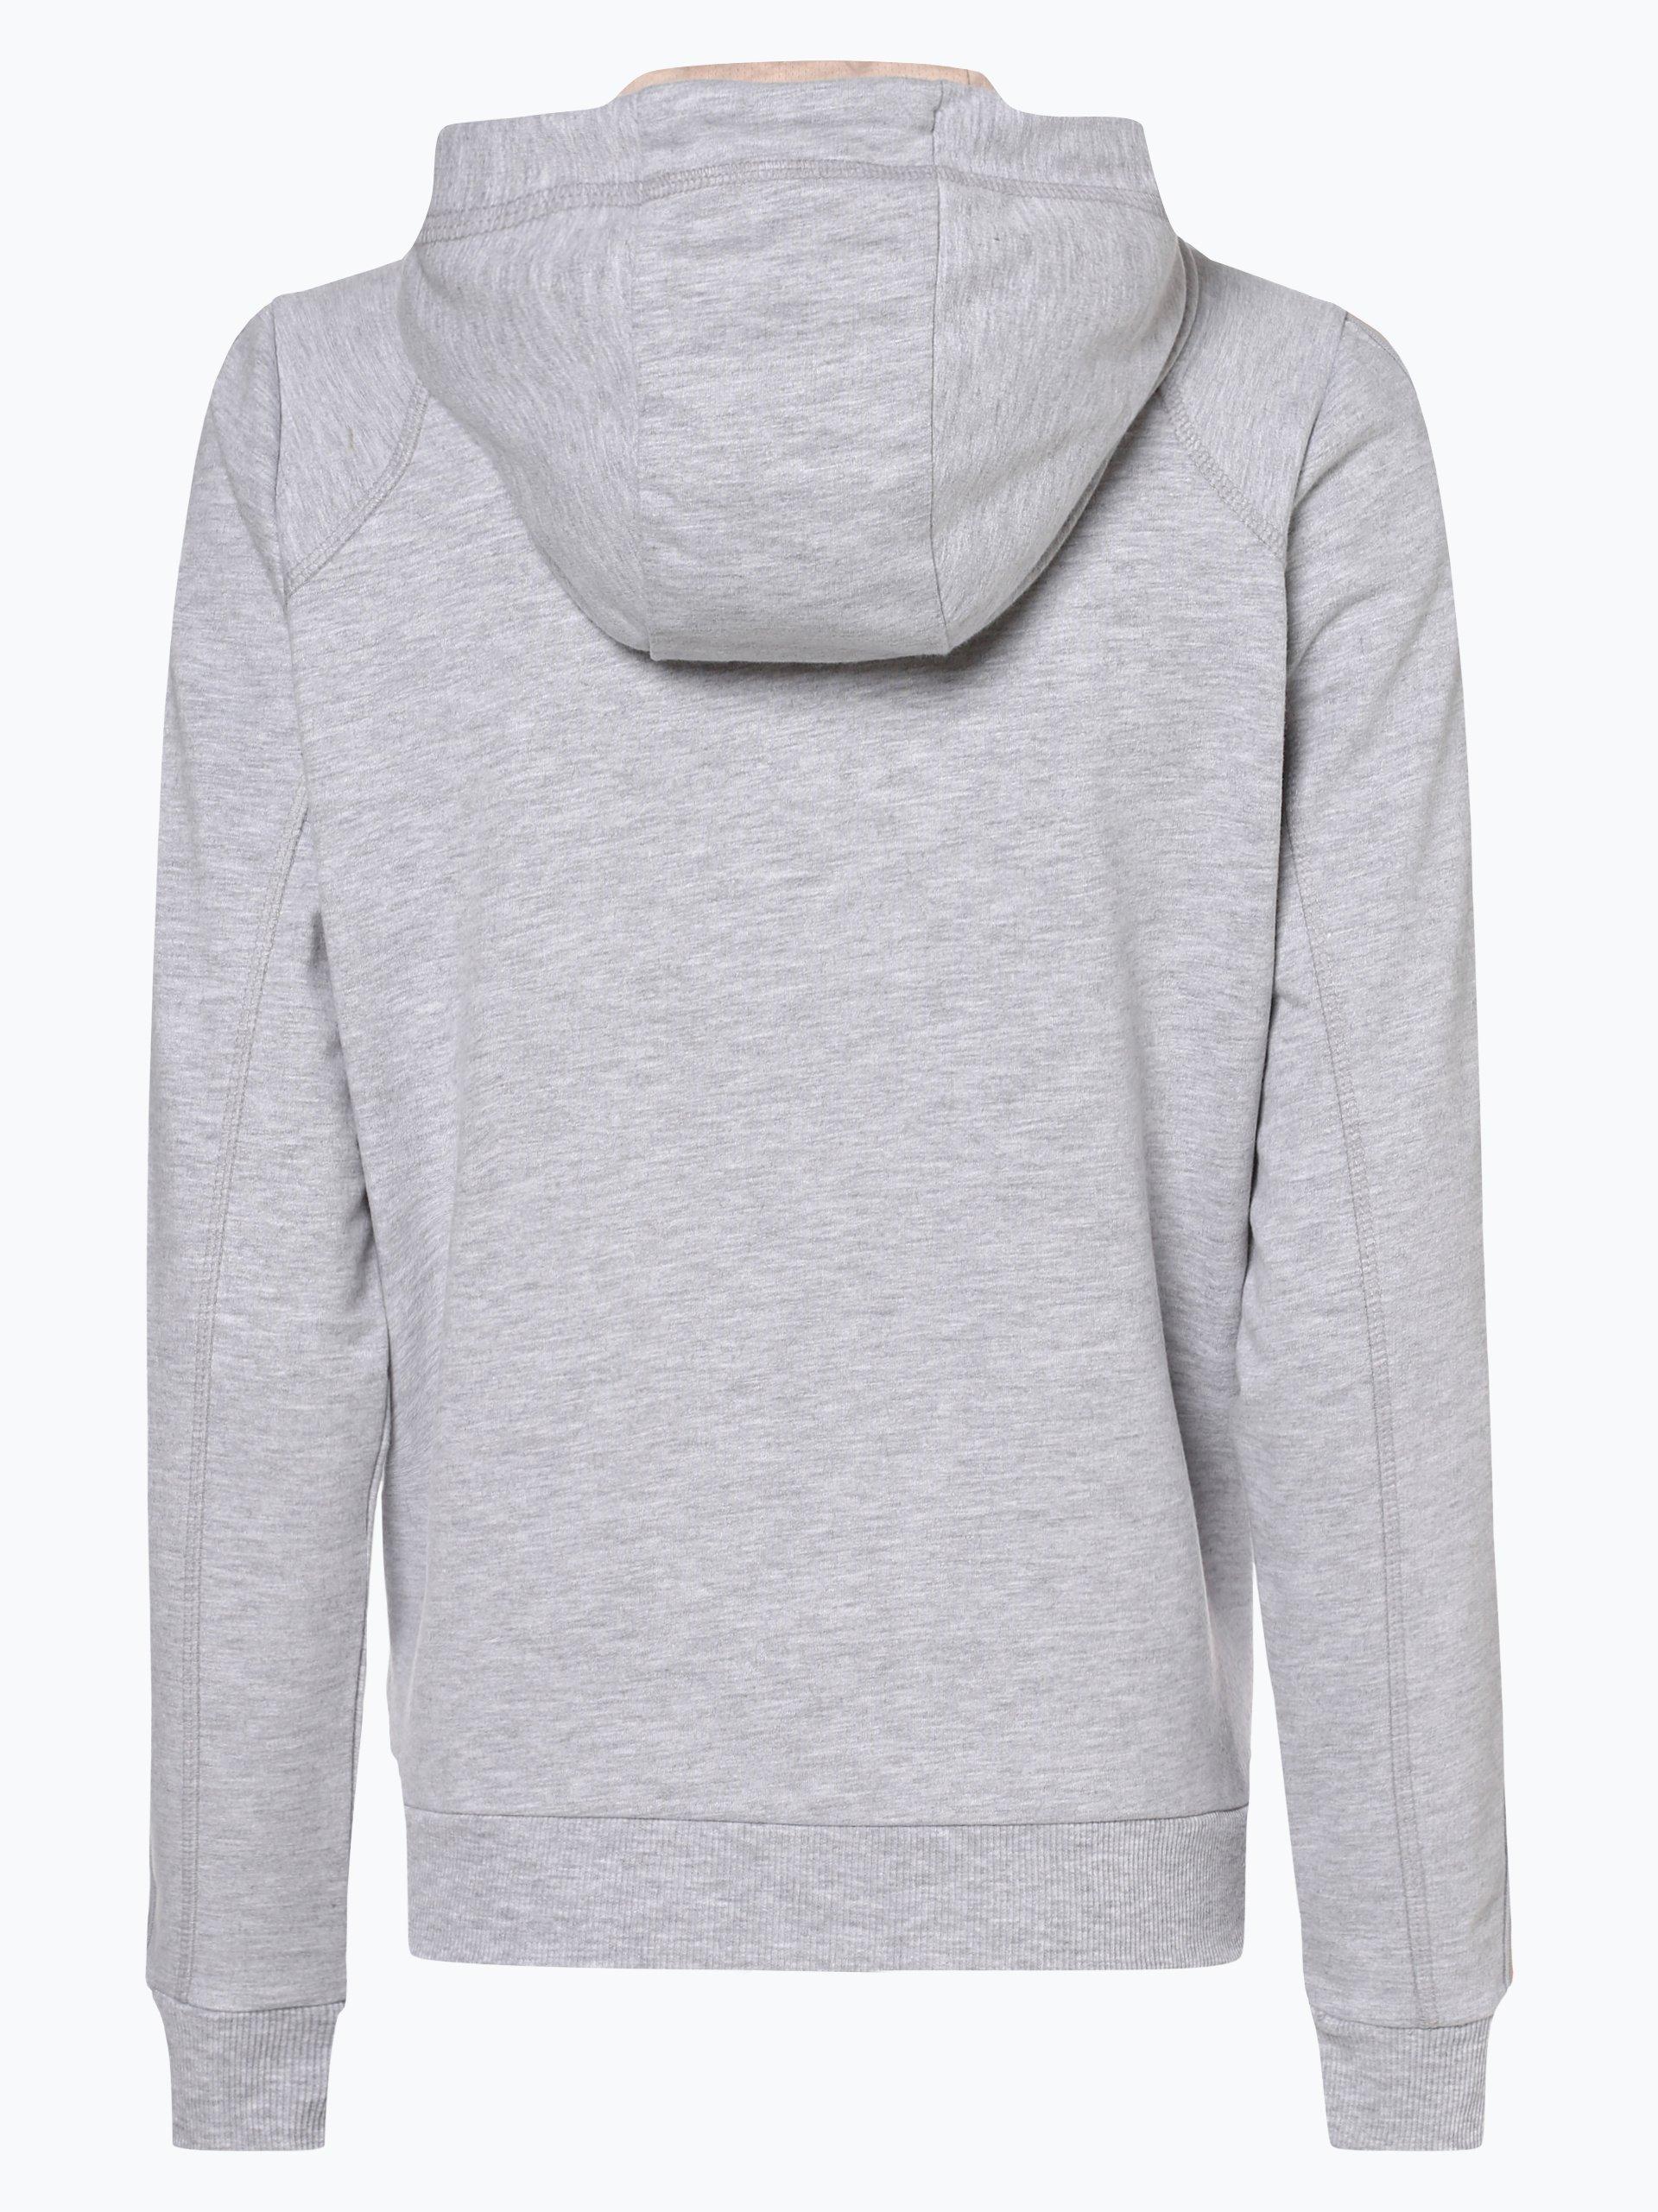 Marie Lund Sport Damska bluza rozpinana